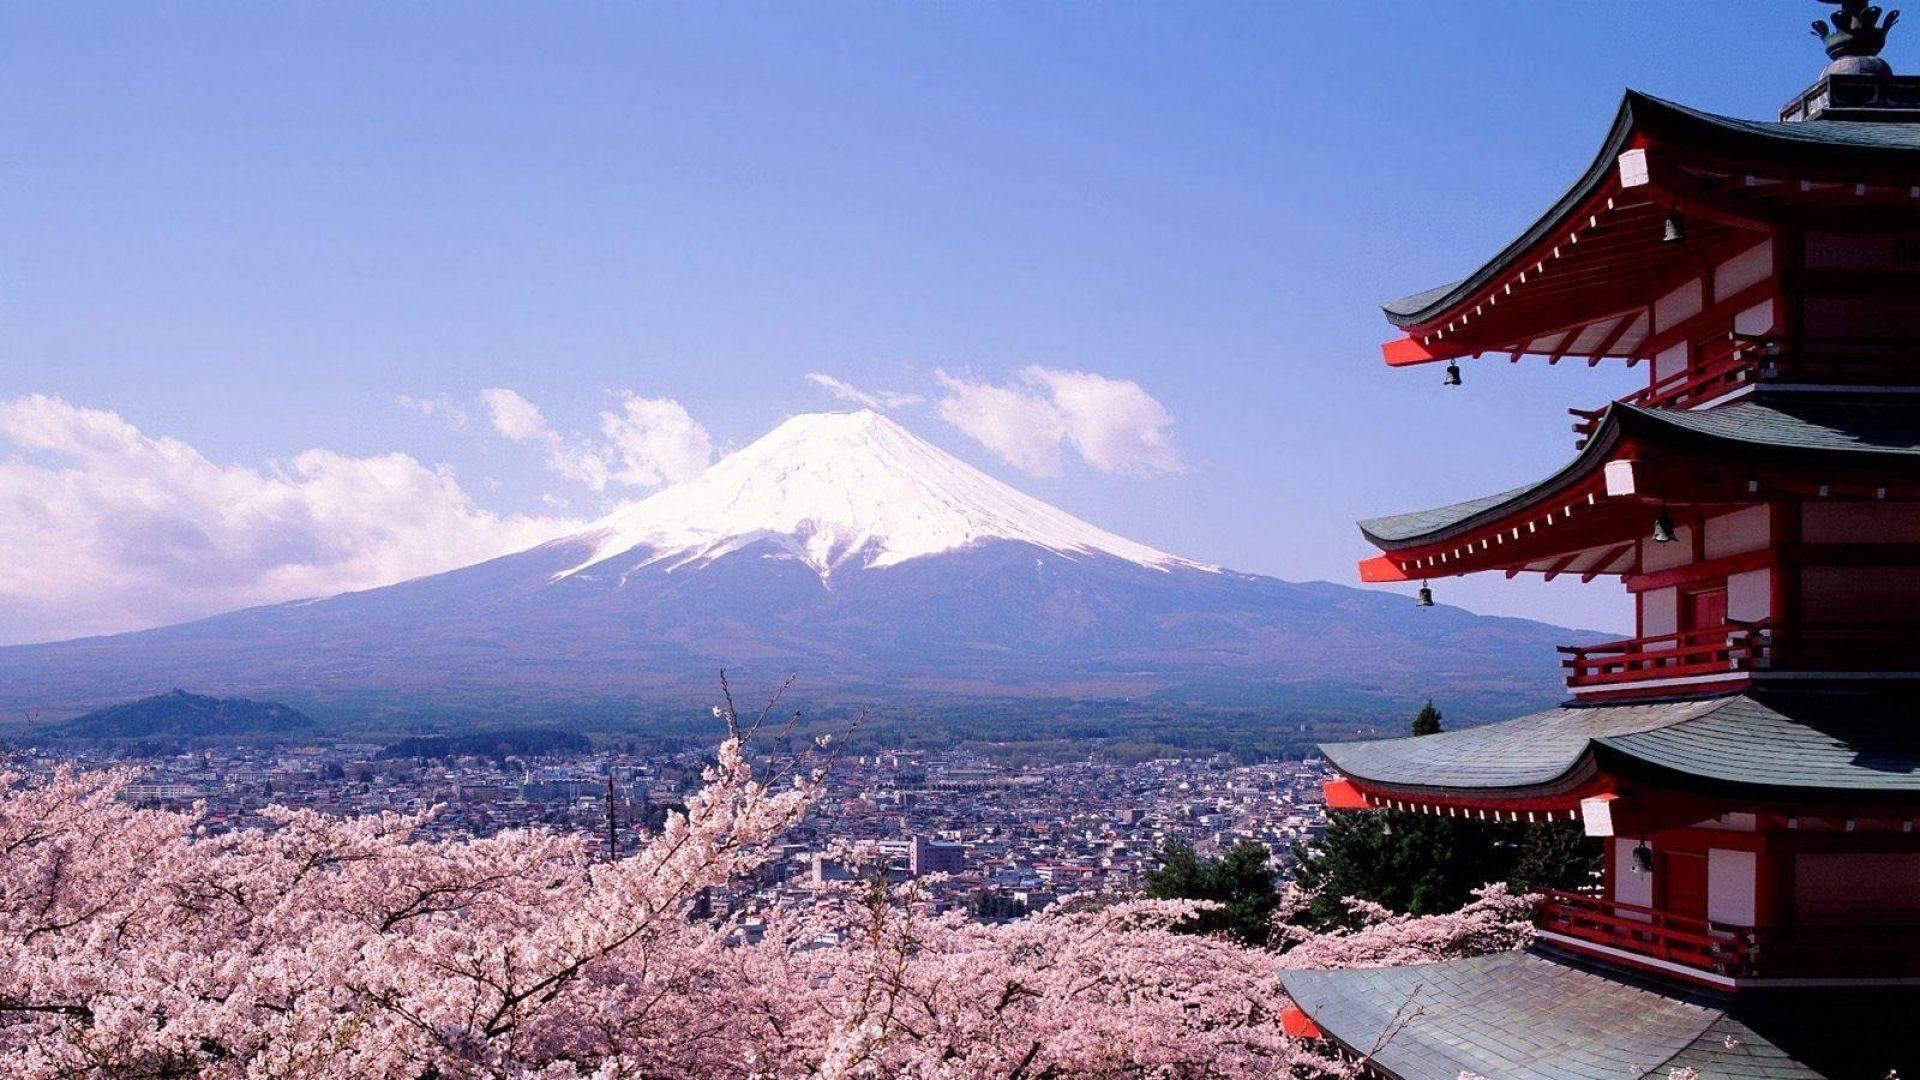 paisajes-de-tokio.jpg